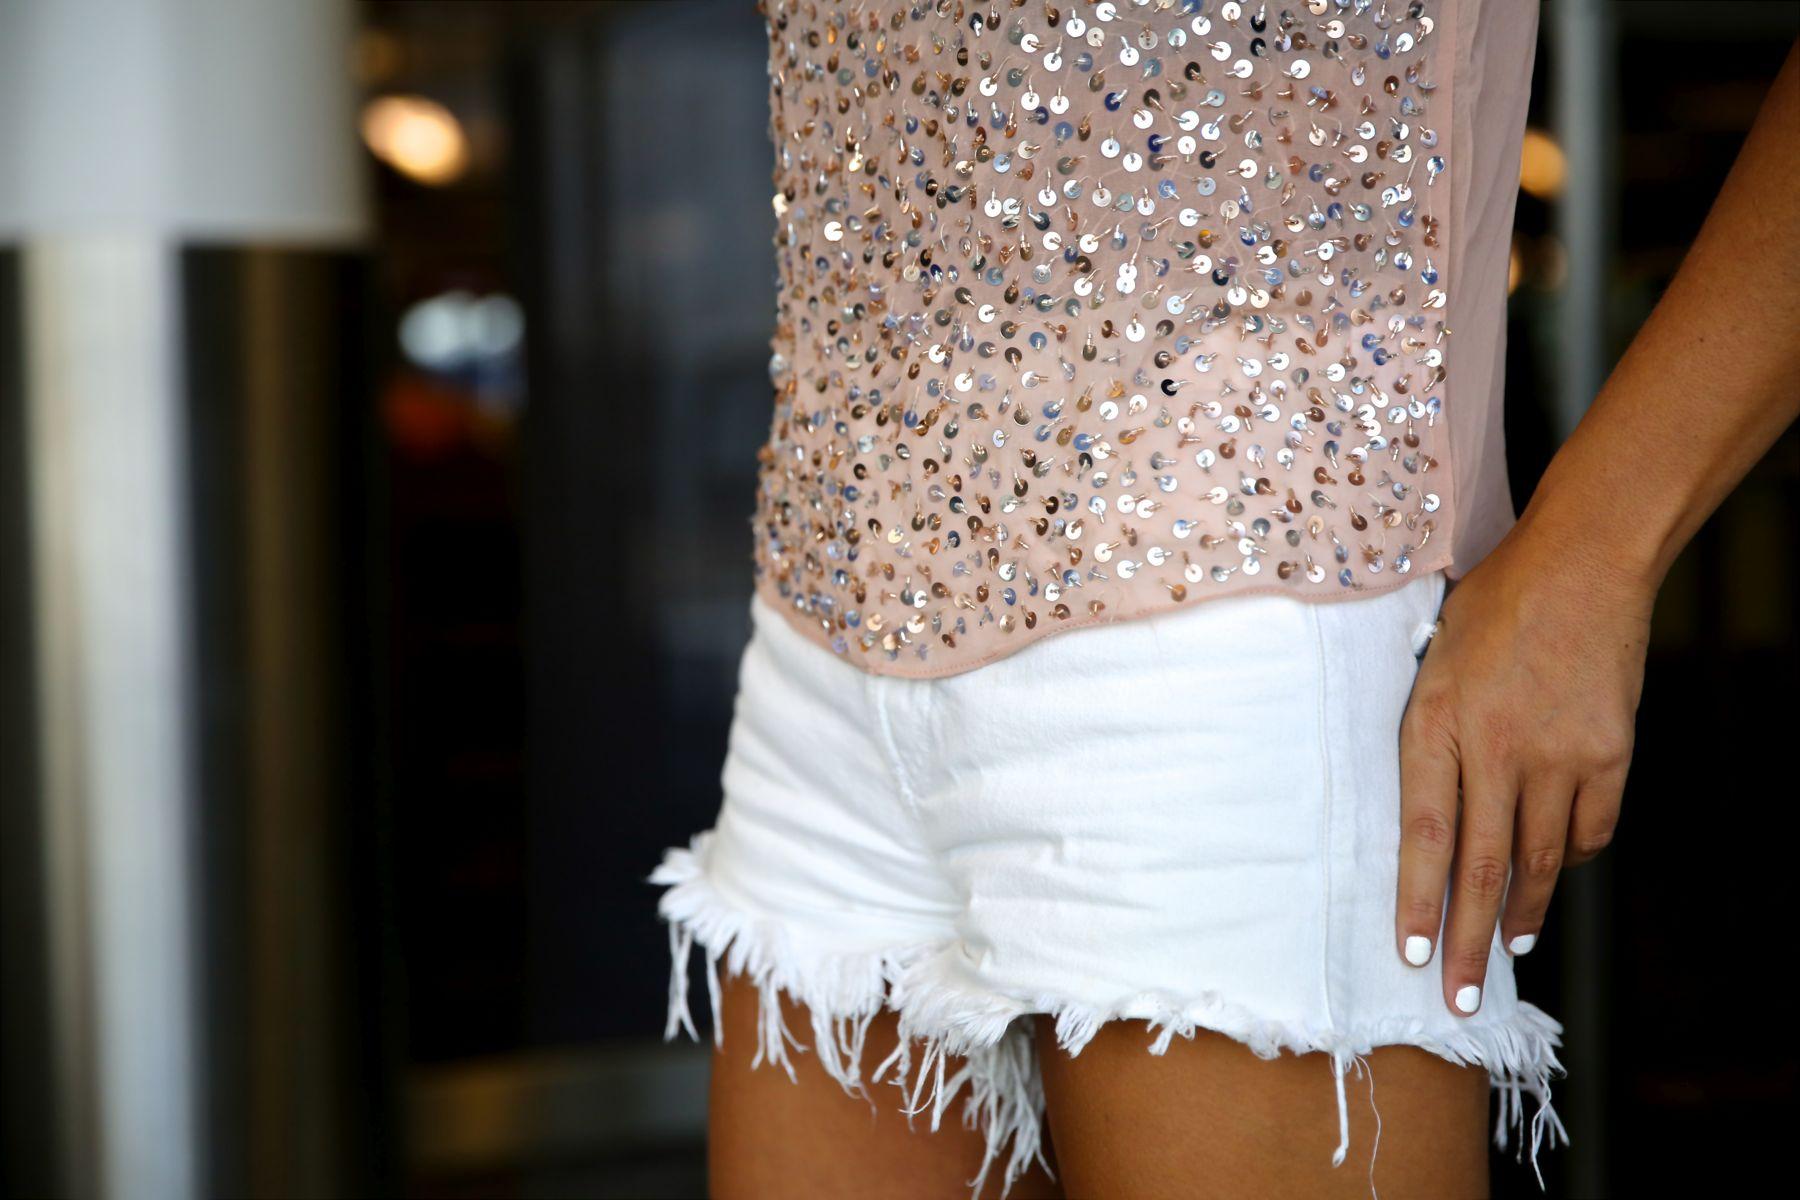 trendy_taste-look-outfit-street_style-ootd-blog-blogger-fashion_spain-moda_españa-traveling-viaje-frankfurt-stan_smith-adidas-lentejuelas-top-denim-shorts-vaqueros_rotos-4